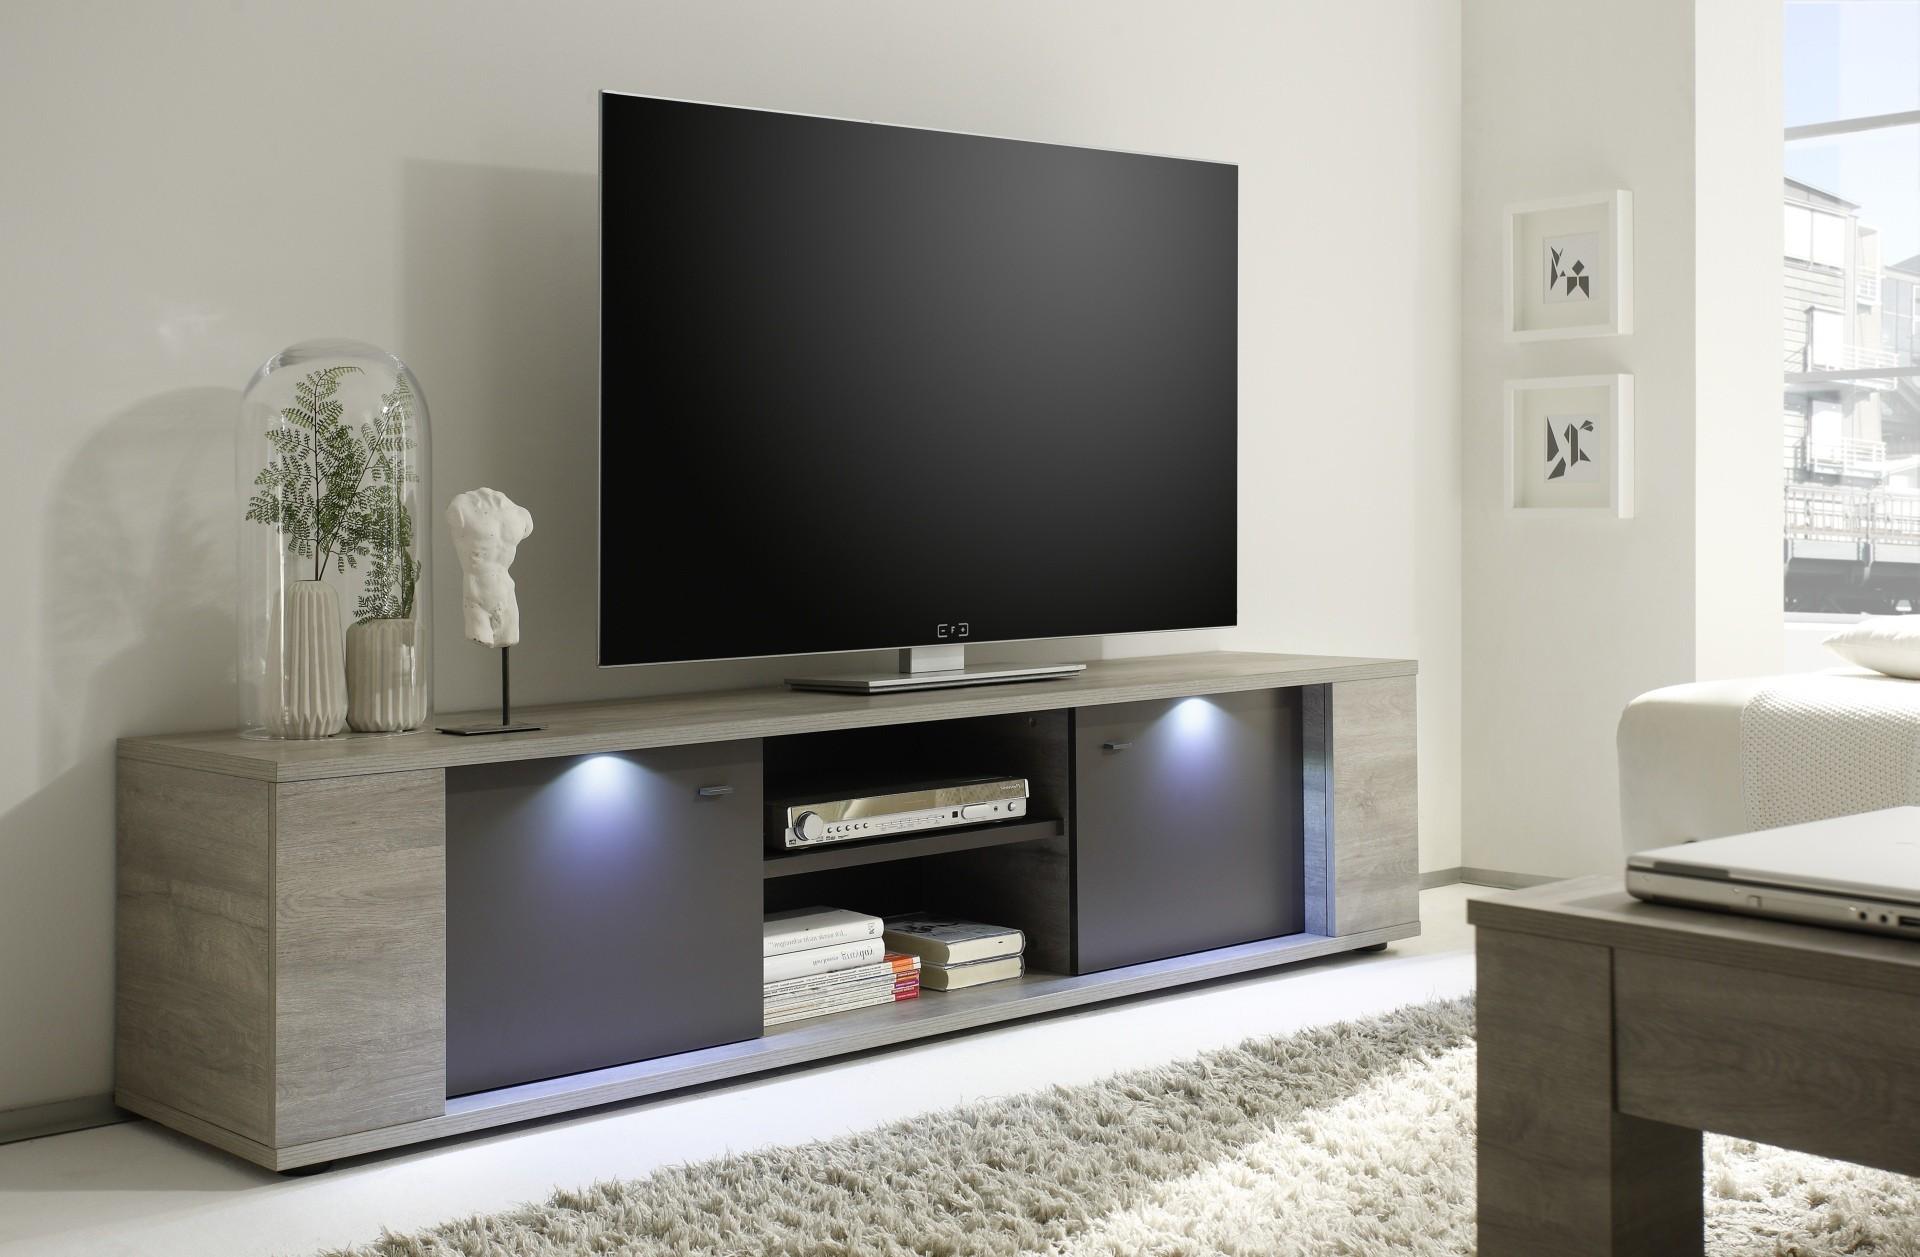 Meubles Rangement Chambre Rangement Chambre Ikea Idee Deco Salon